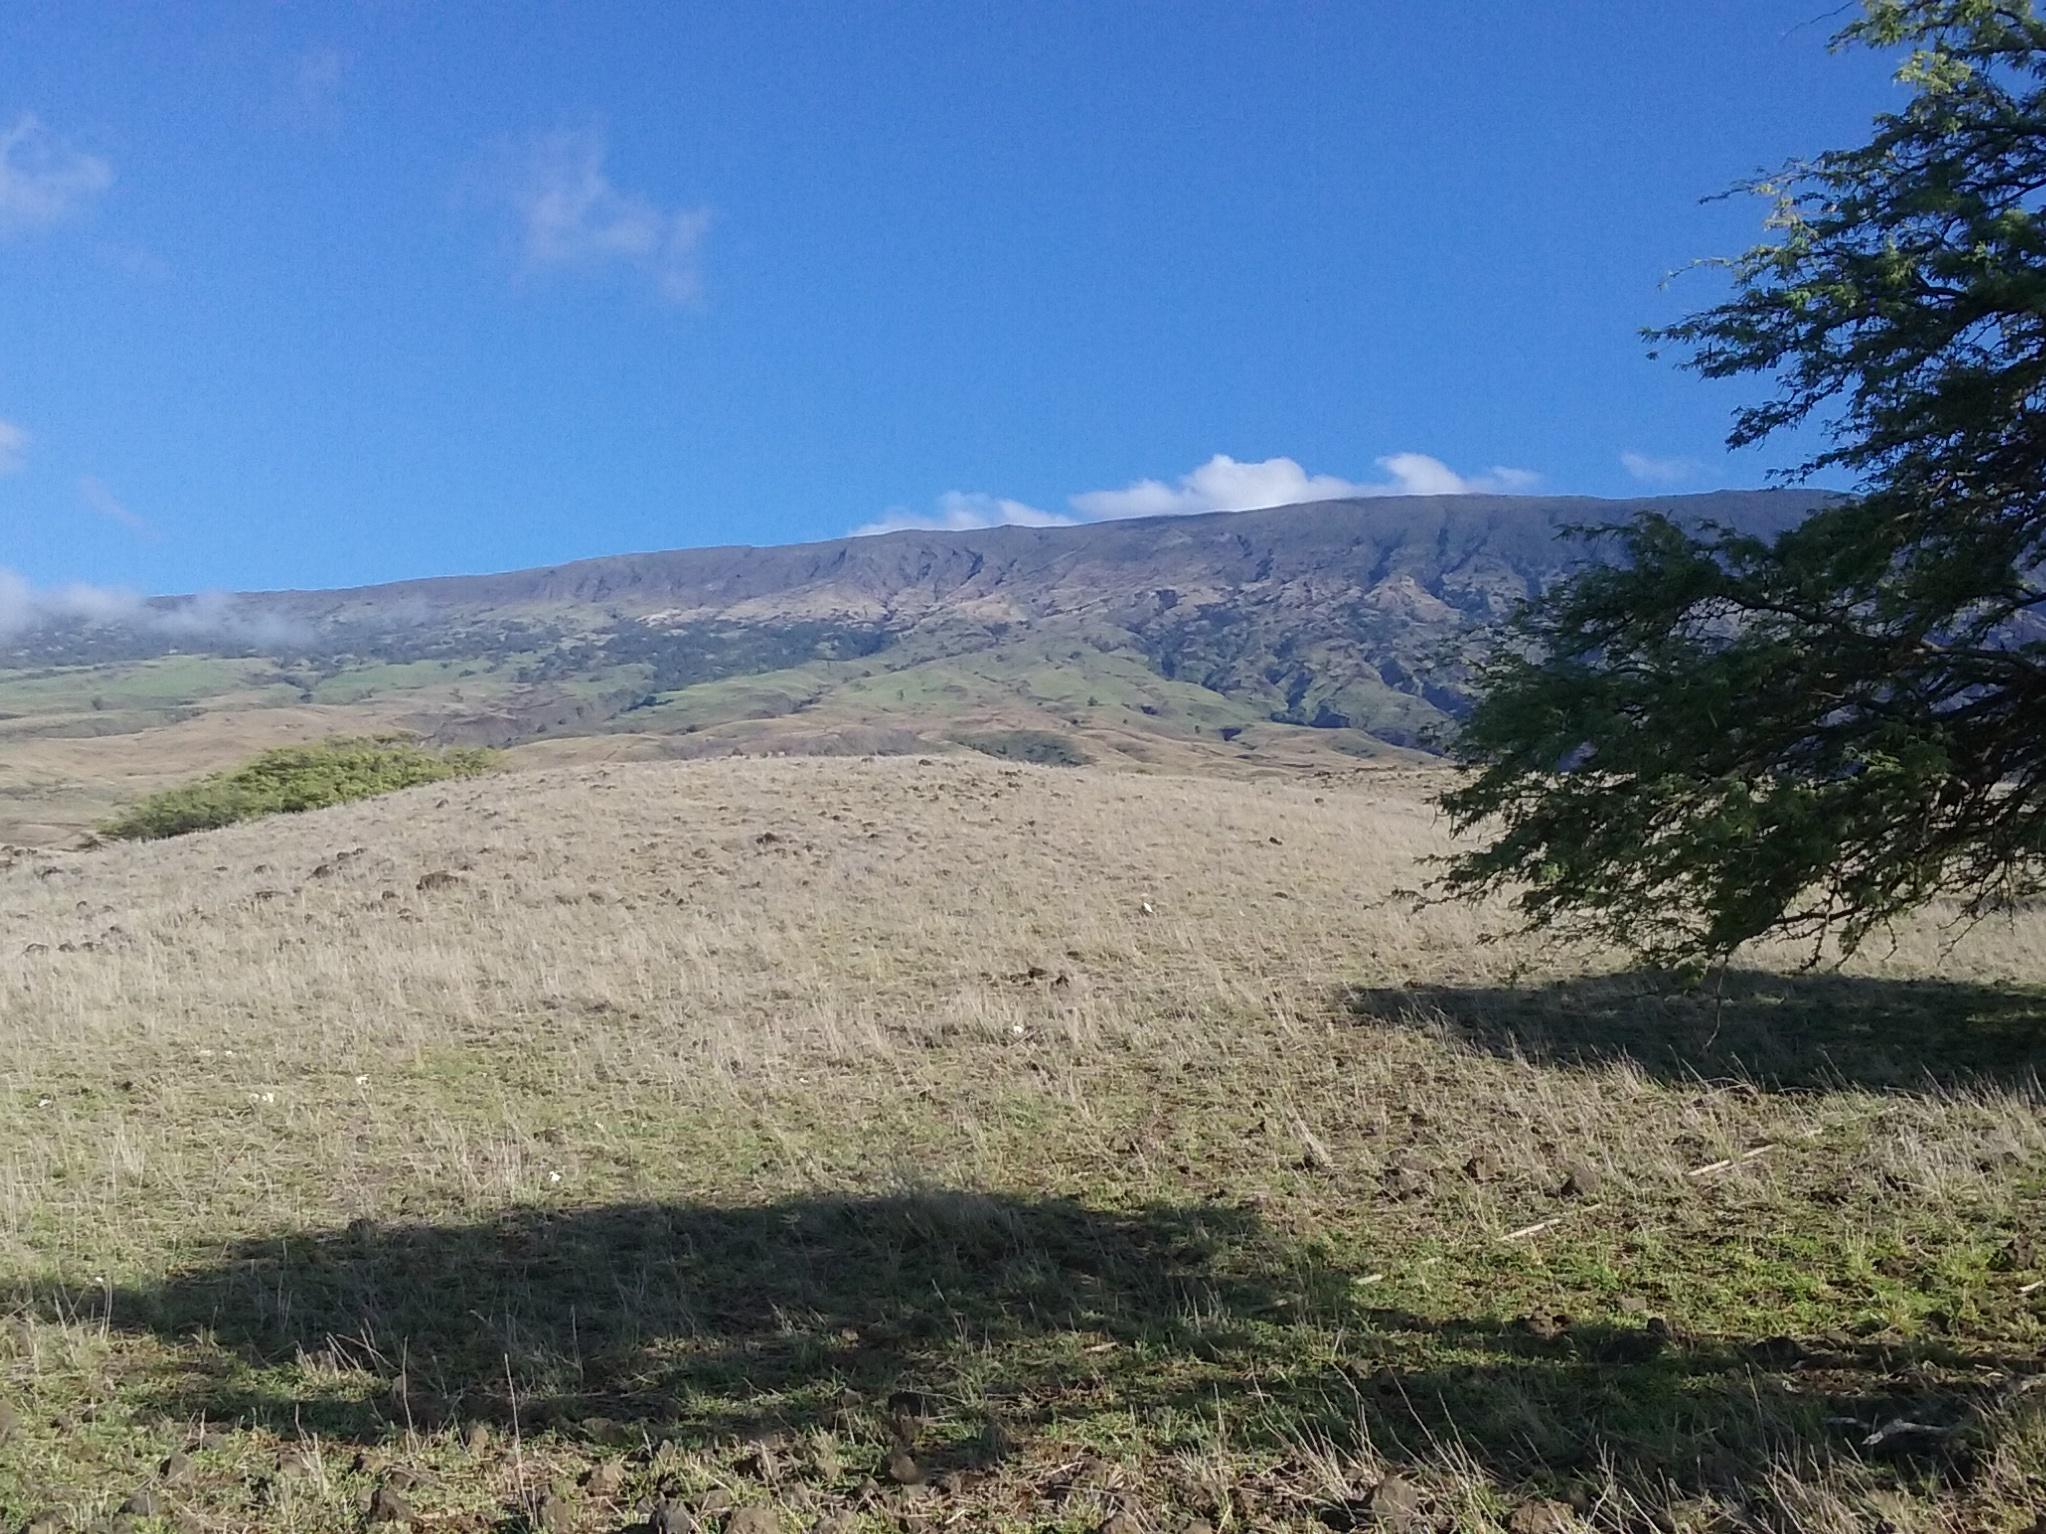 Southeast Haleakala - Credit: Alan Mair, USGS